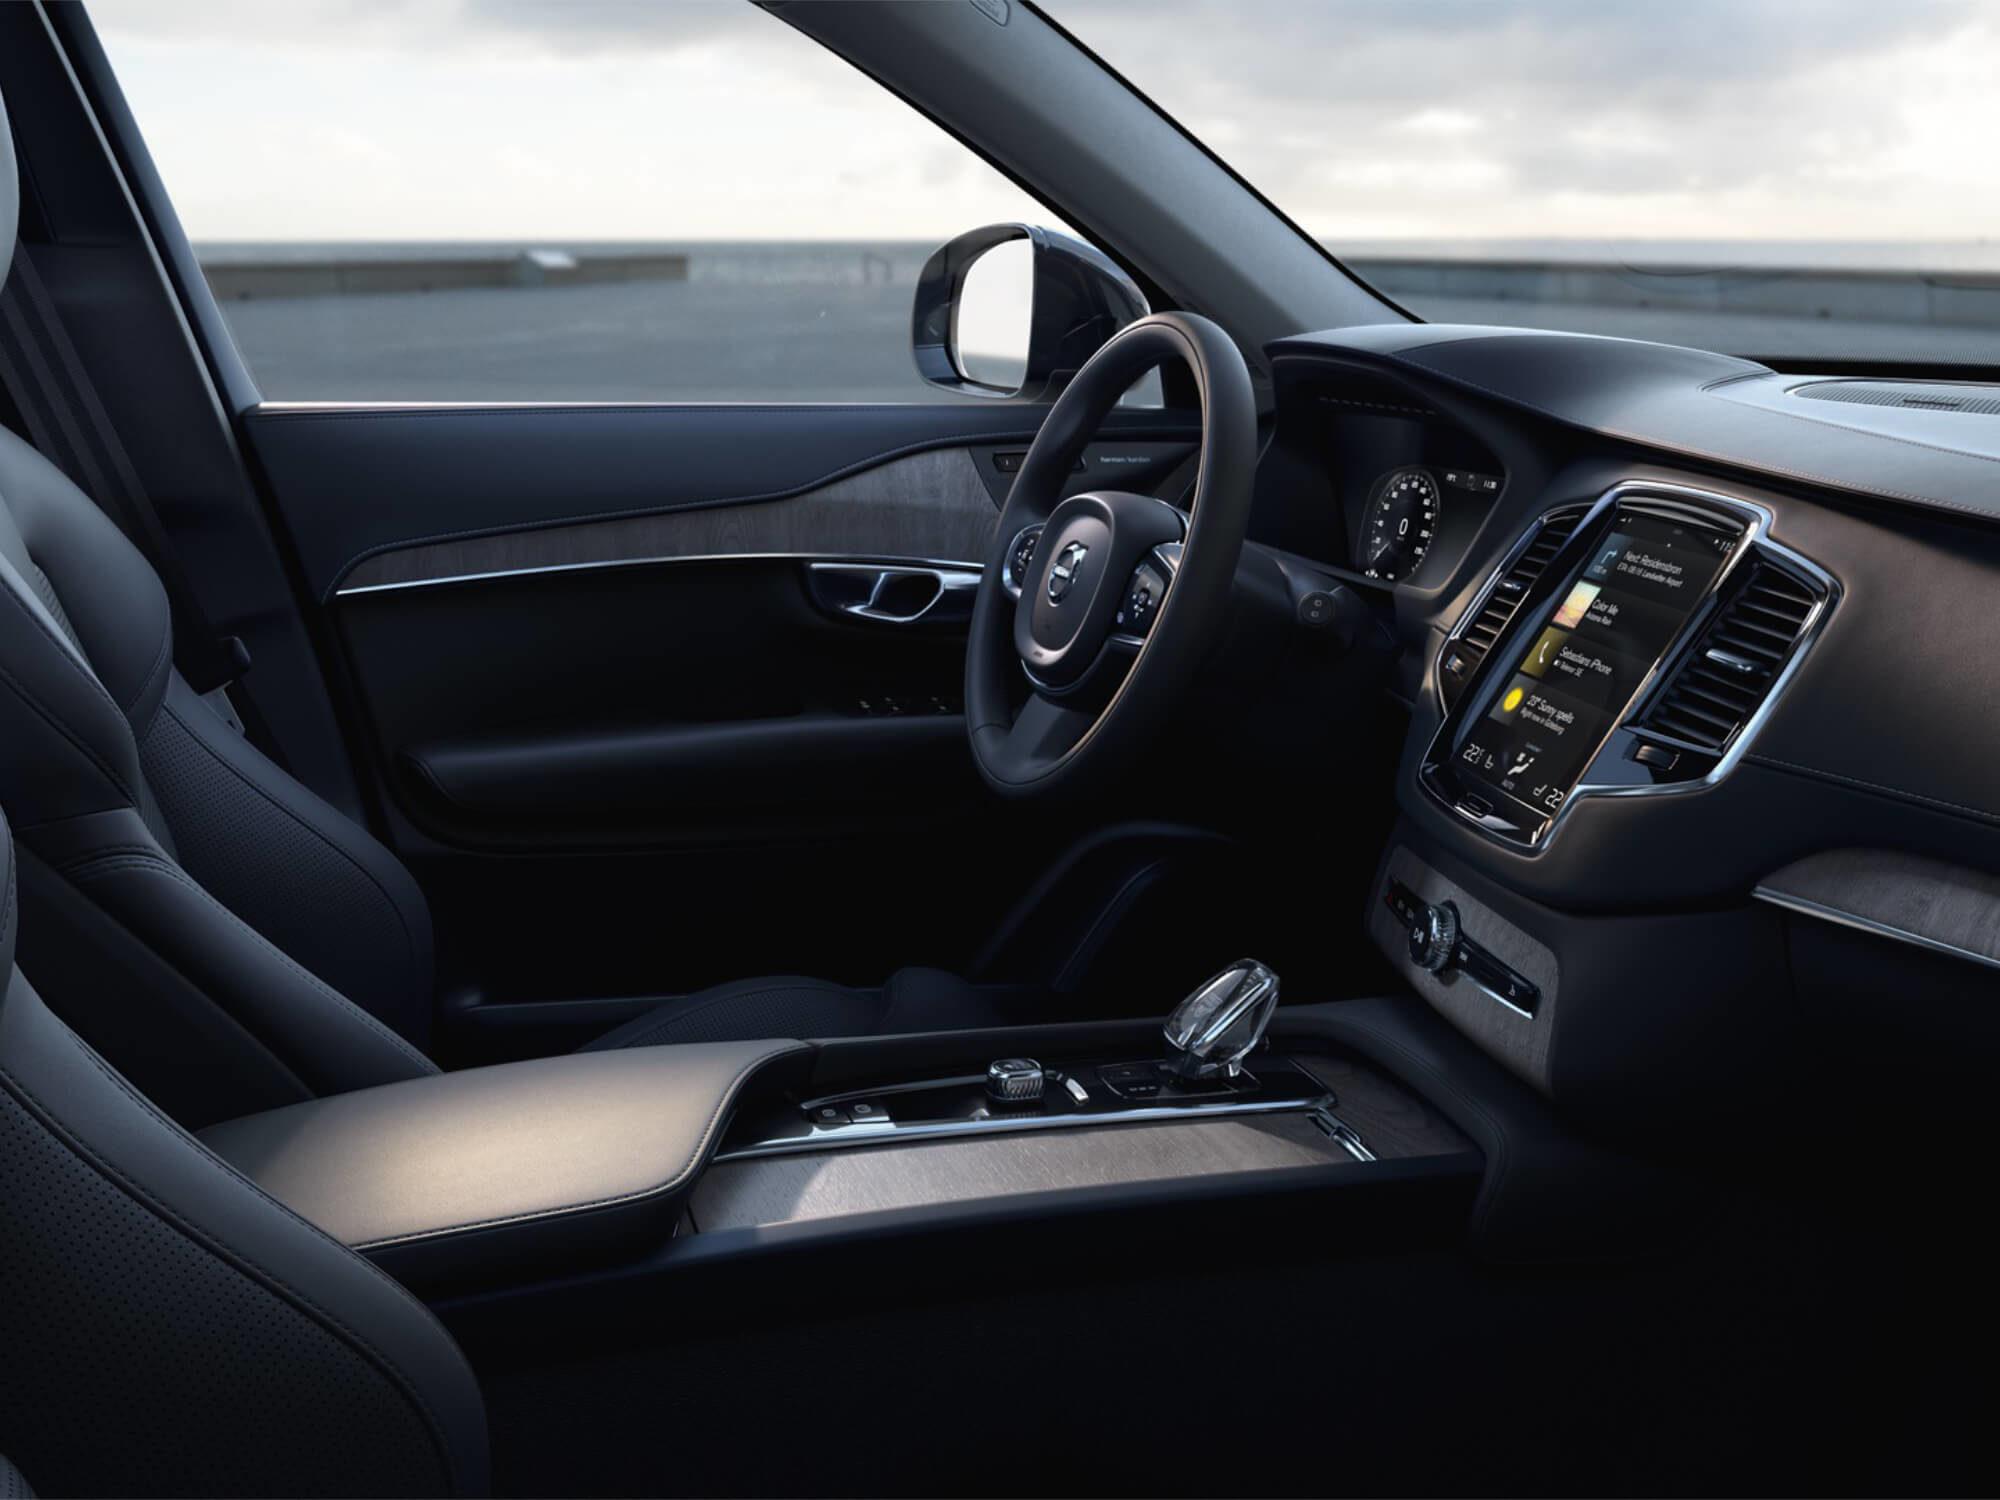 Volvo XC90 T8 Plug-in Hybrid Inscription Exclusive dashboard